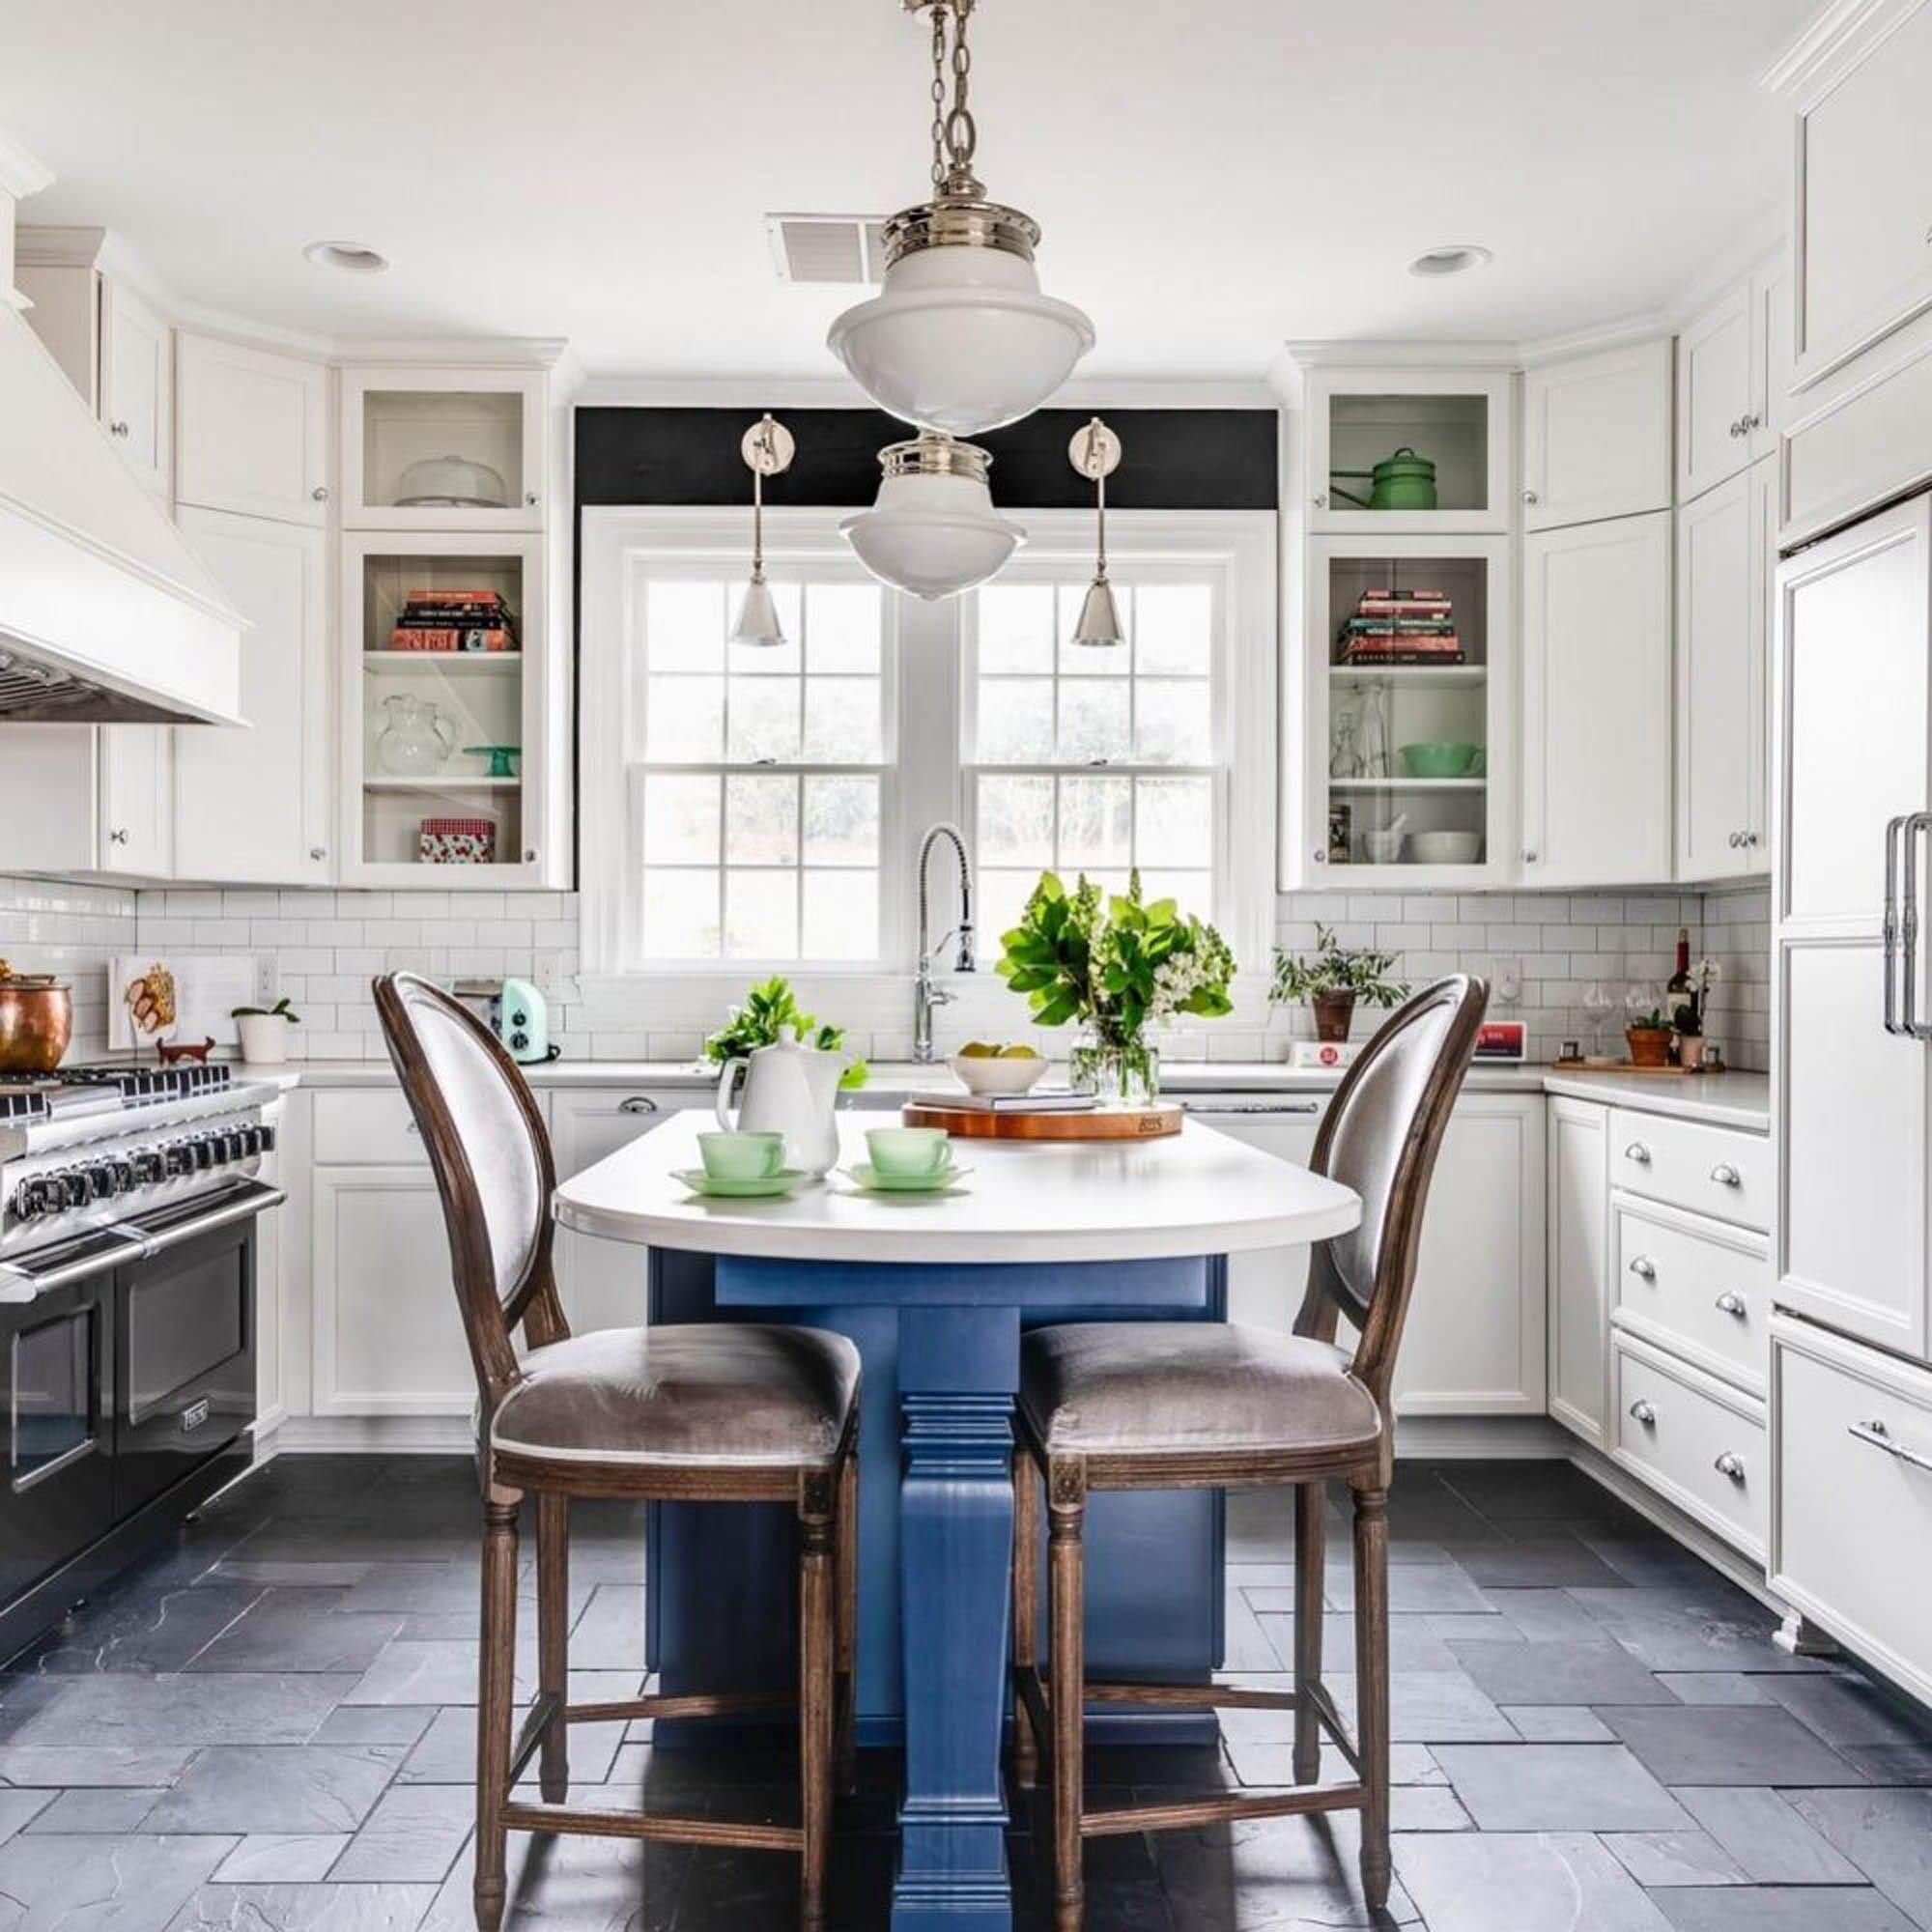 Royal blue kitchen island